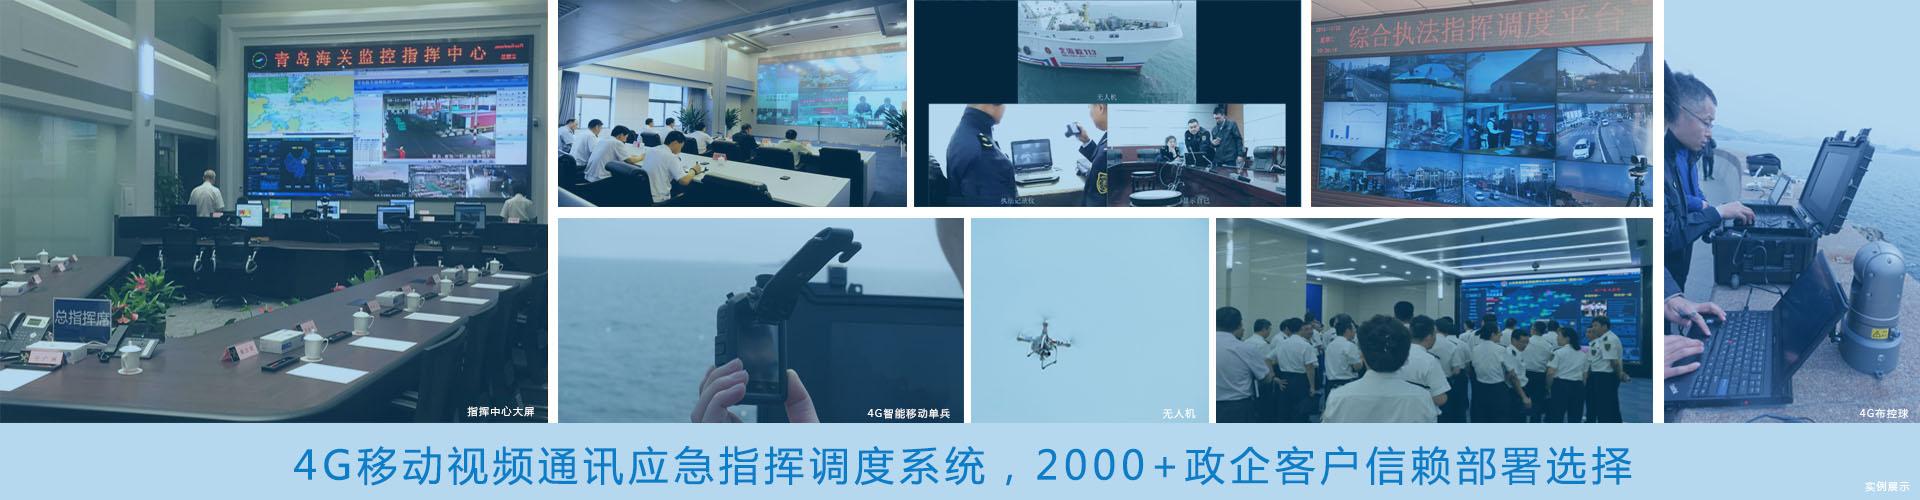 4G移动视频通讯指挥系统实例展示.jpg